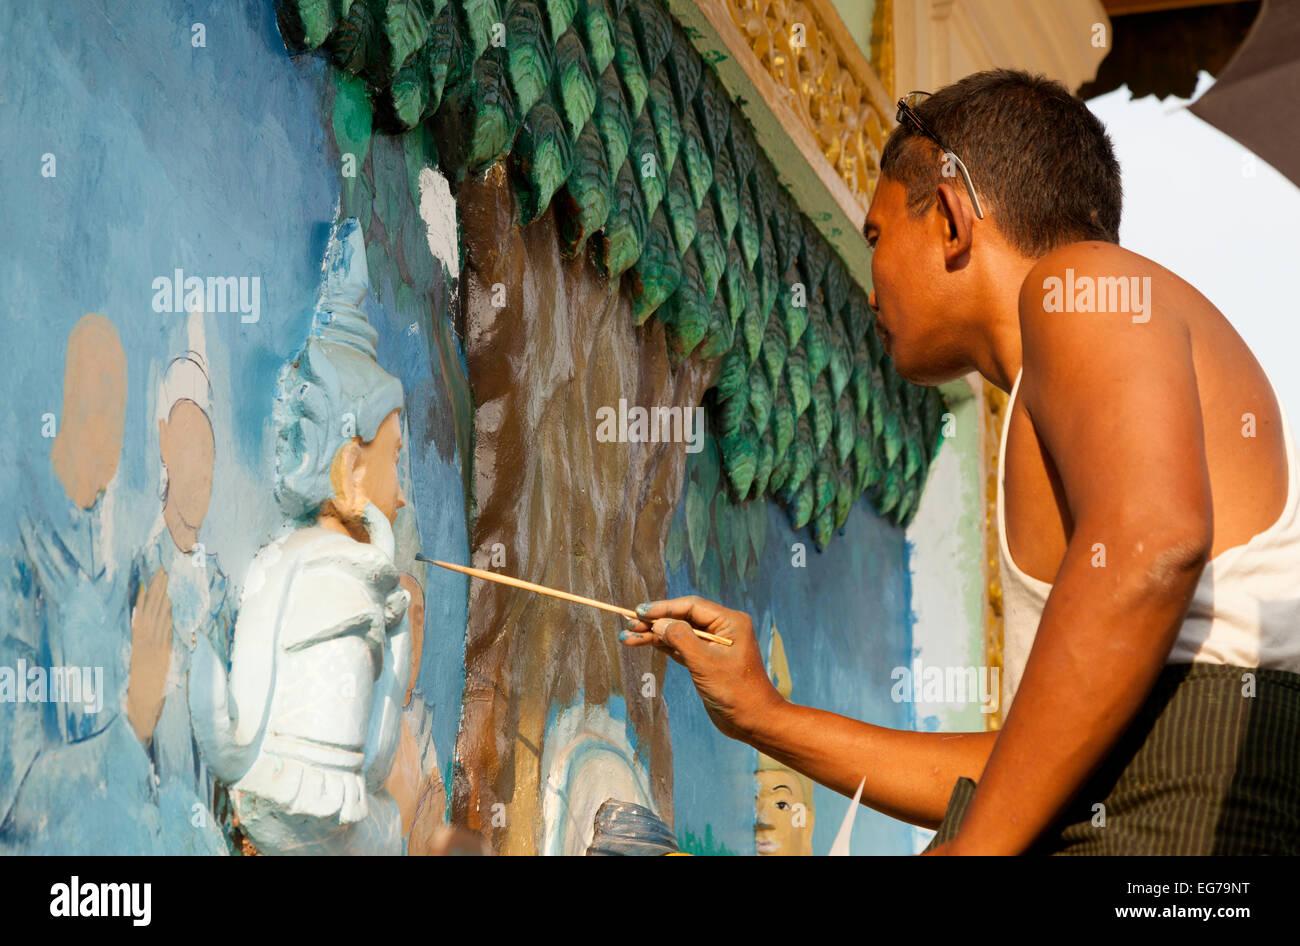 A burmese painter painting religious pictures, Shwedagon Pagoda, Yangon, Myanmar ( Burma ), Asia - Stock Image